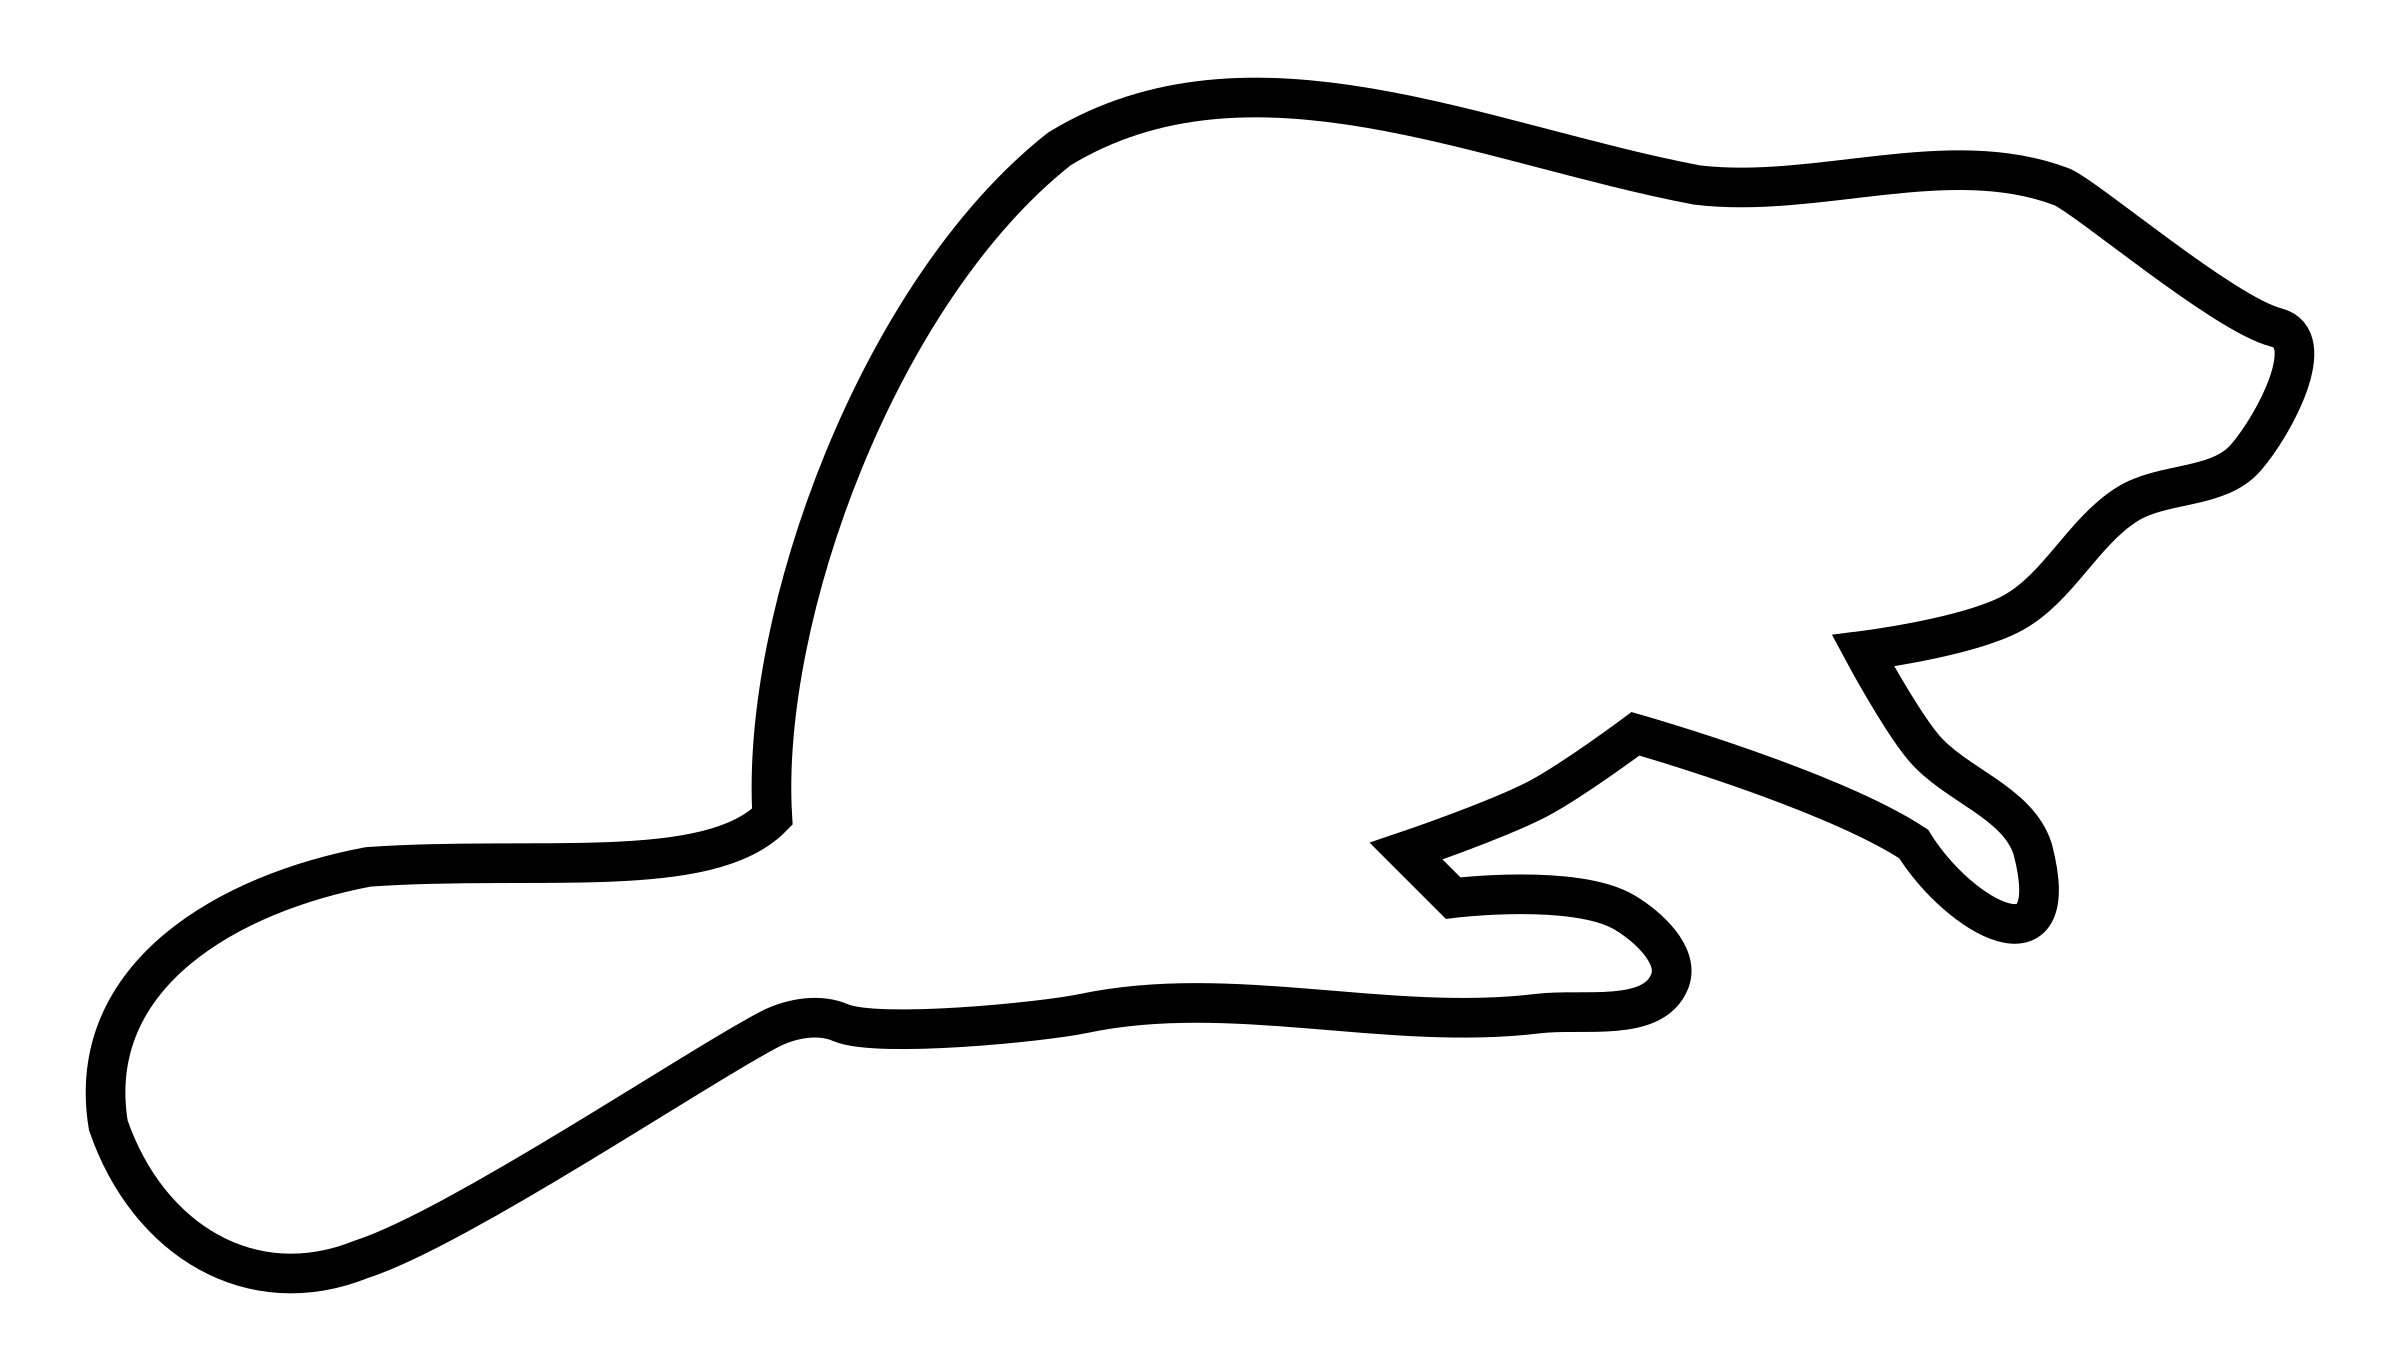 Beaver Outline Silhouette Clipart Panda